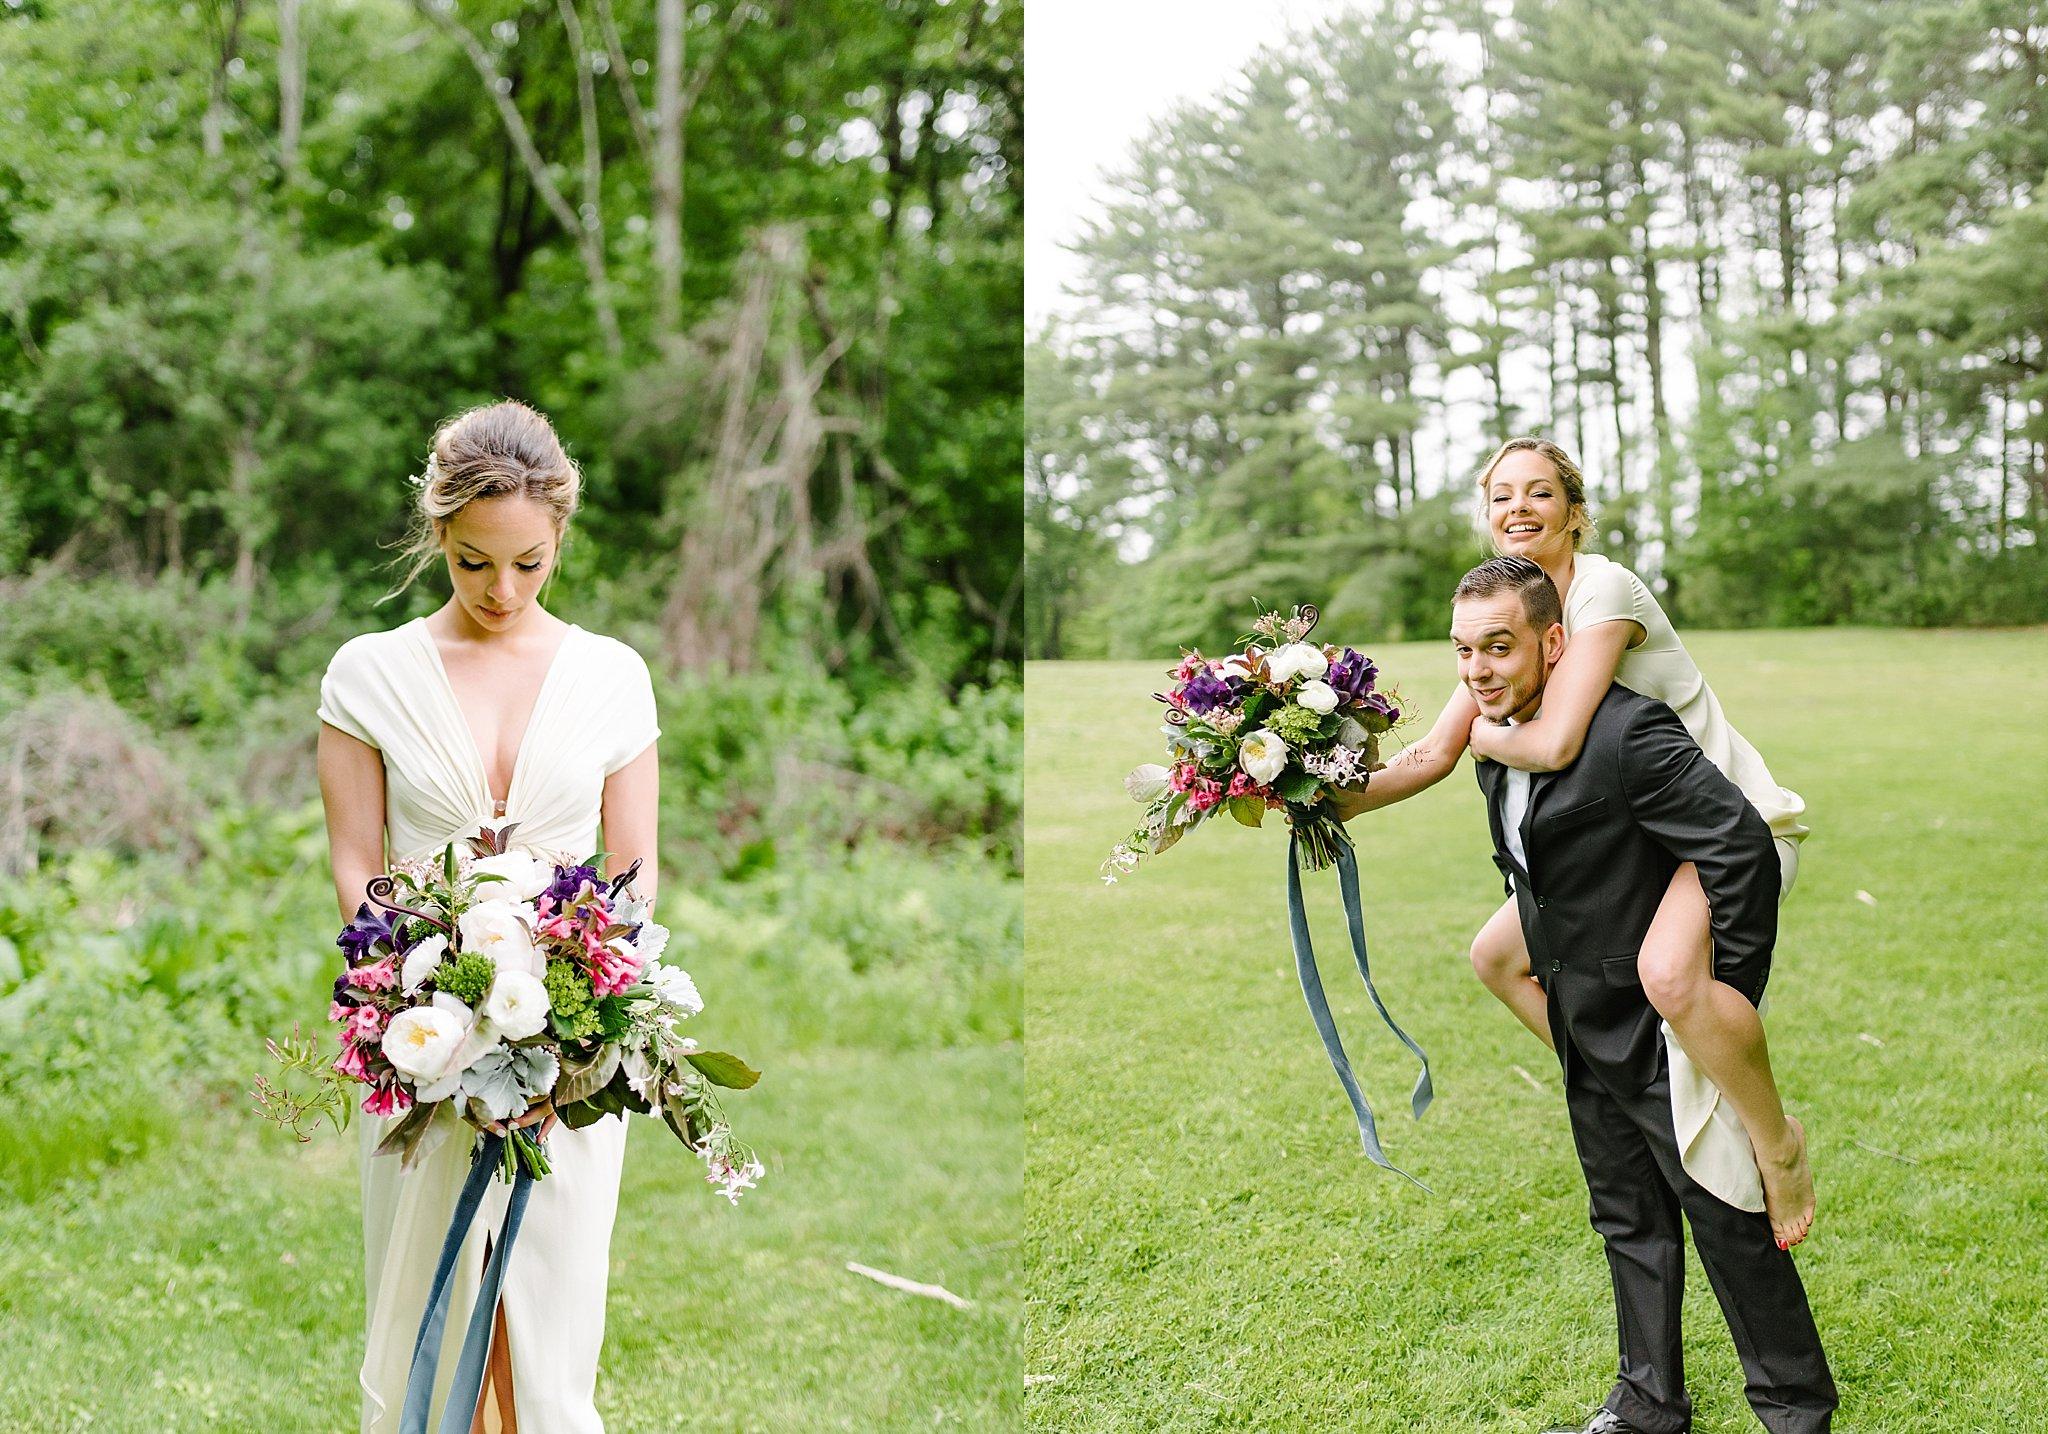 New_england_wedding_photographer_2.jpg